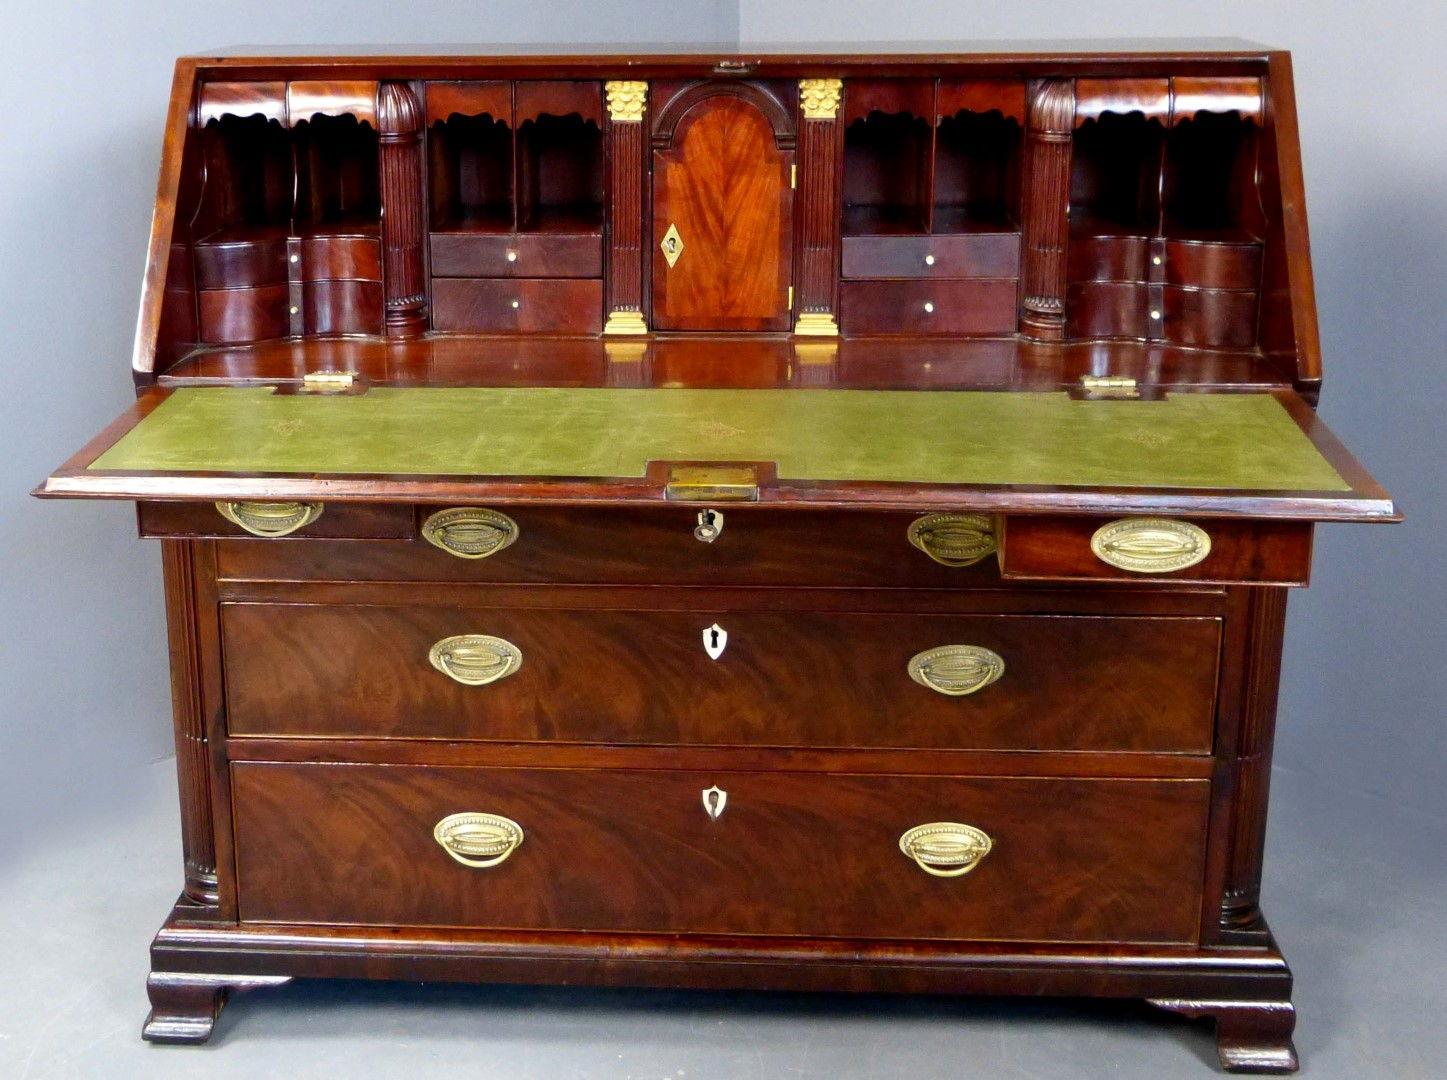 Muebles Antiguos Armarios Antiguos Mesas Antiguas C Modas  # Muebles De Caoba